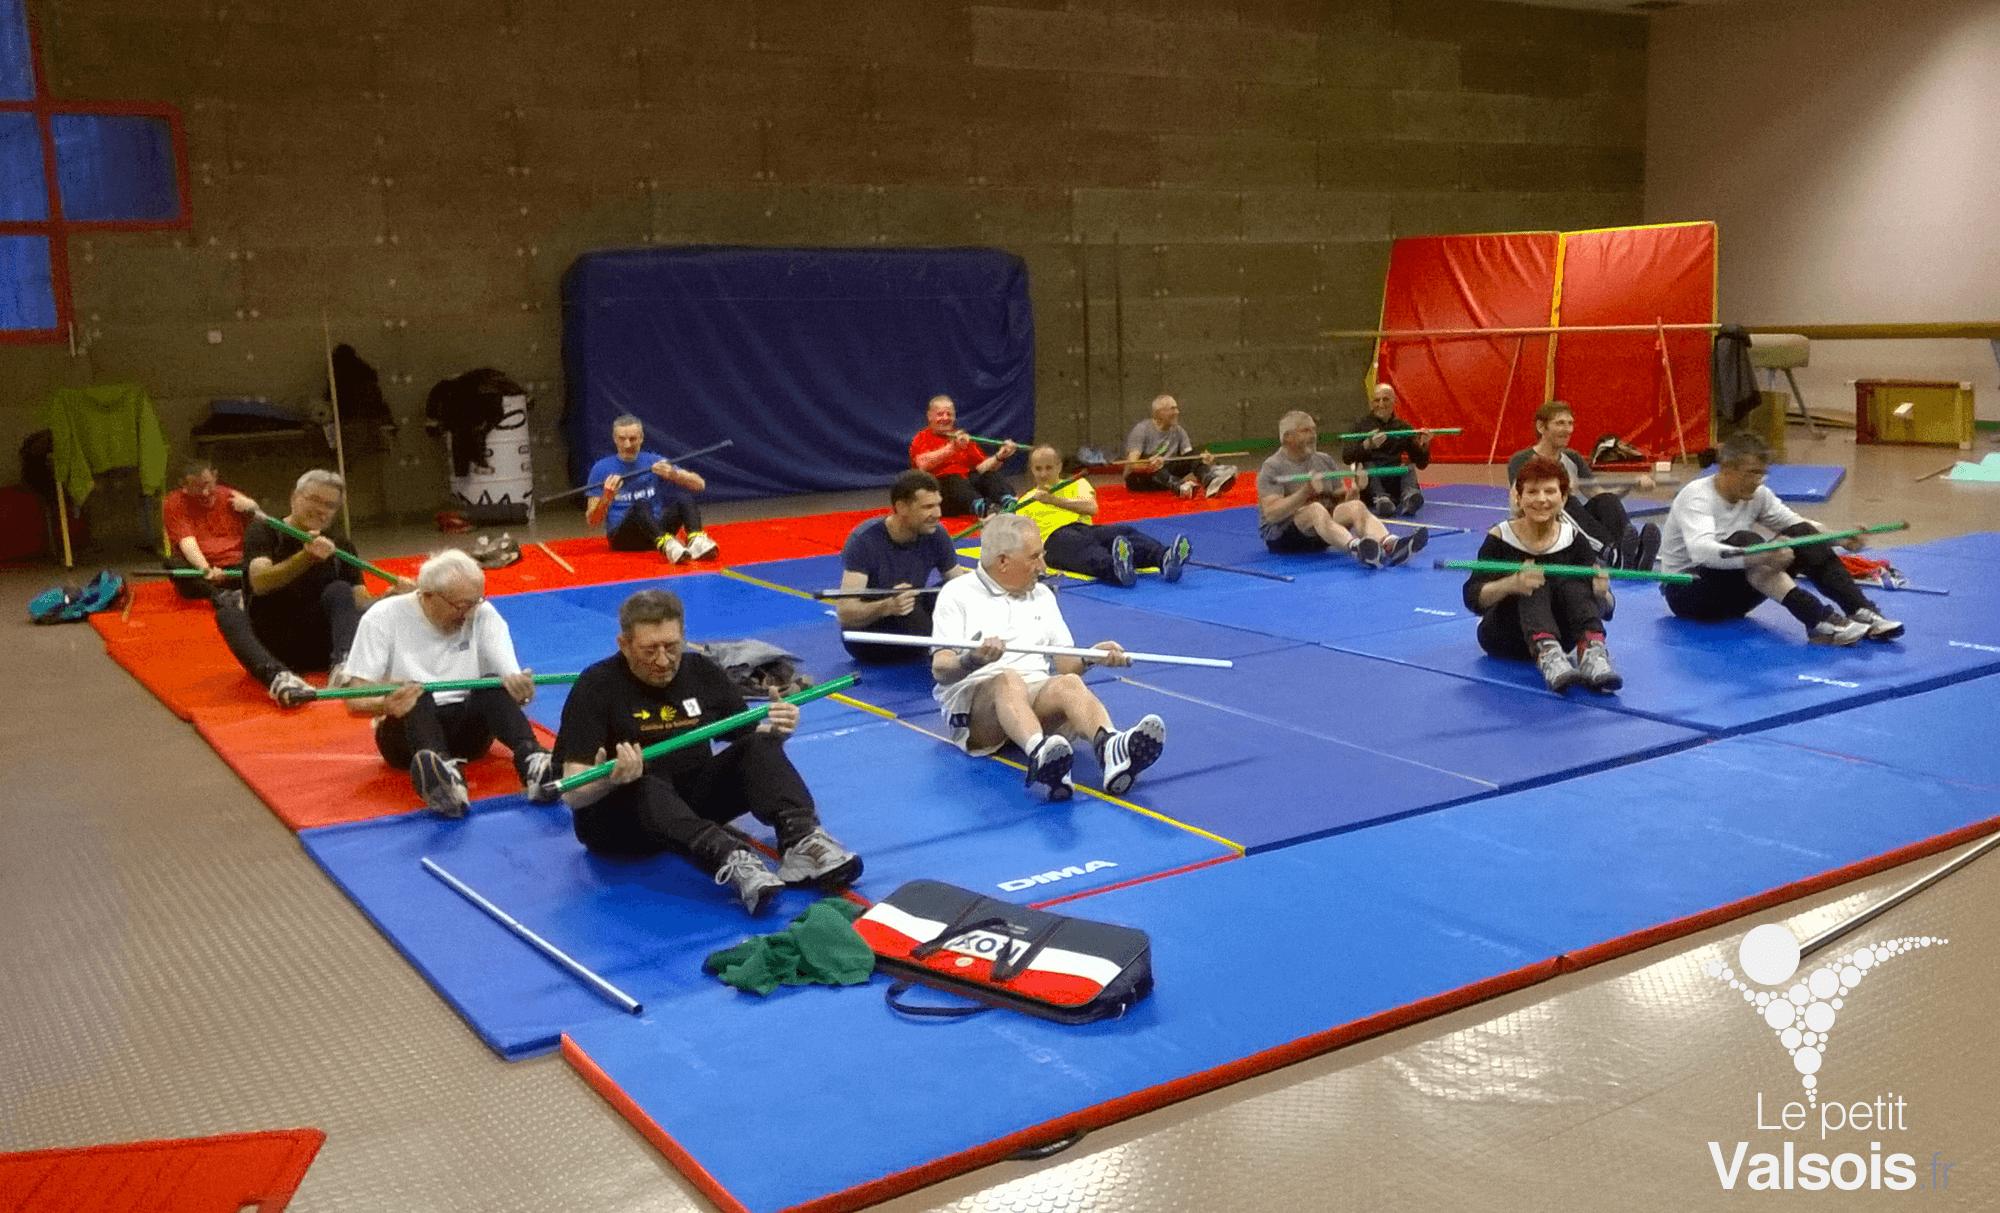 Association Gym Aubenas Vals 07 La Forme (AGAV07)